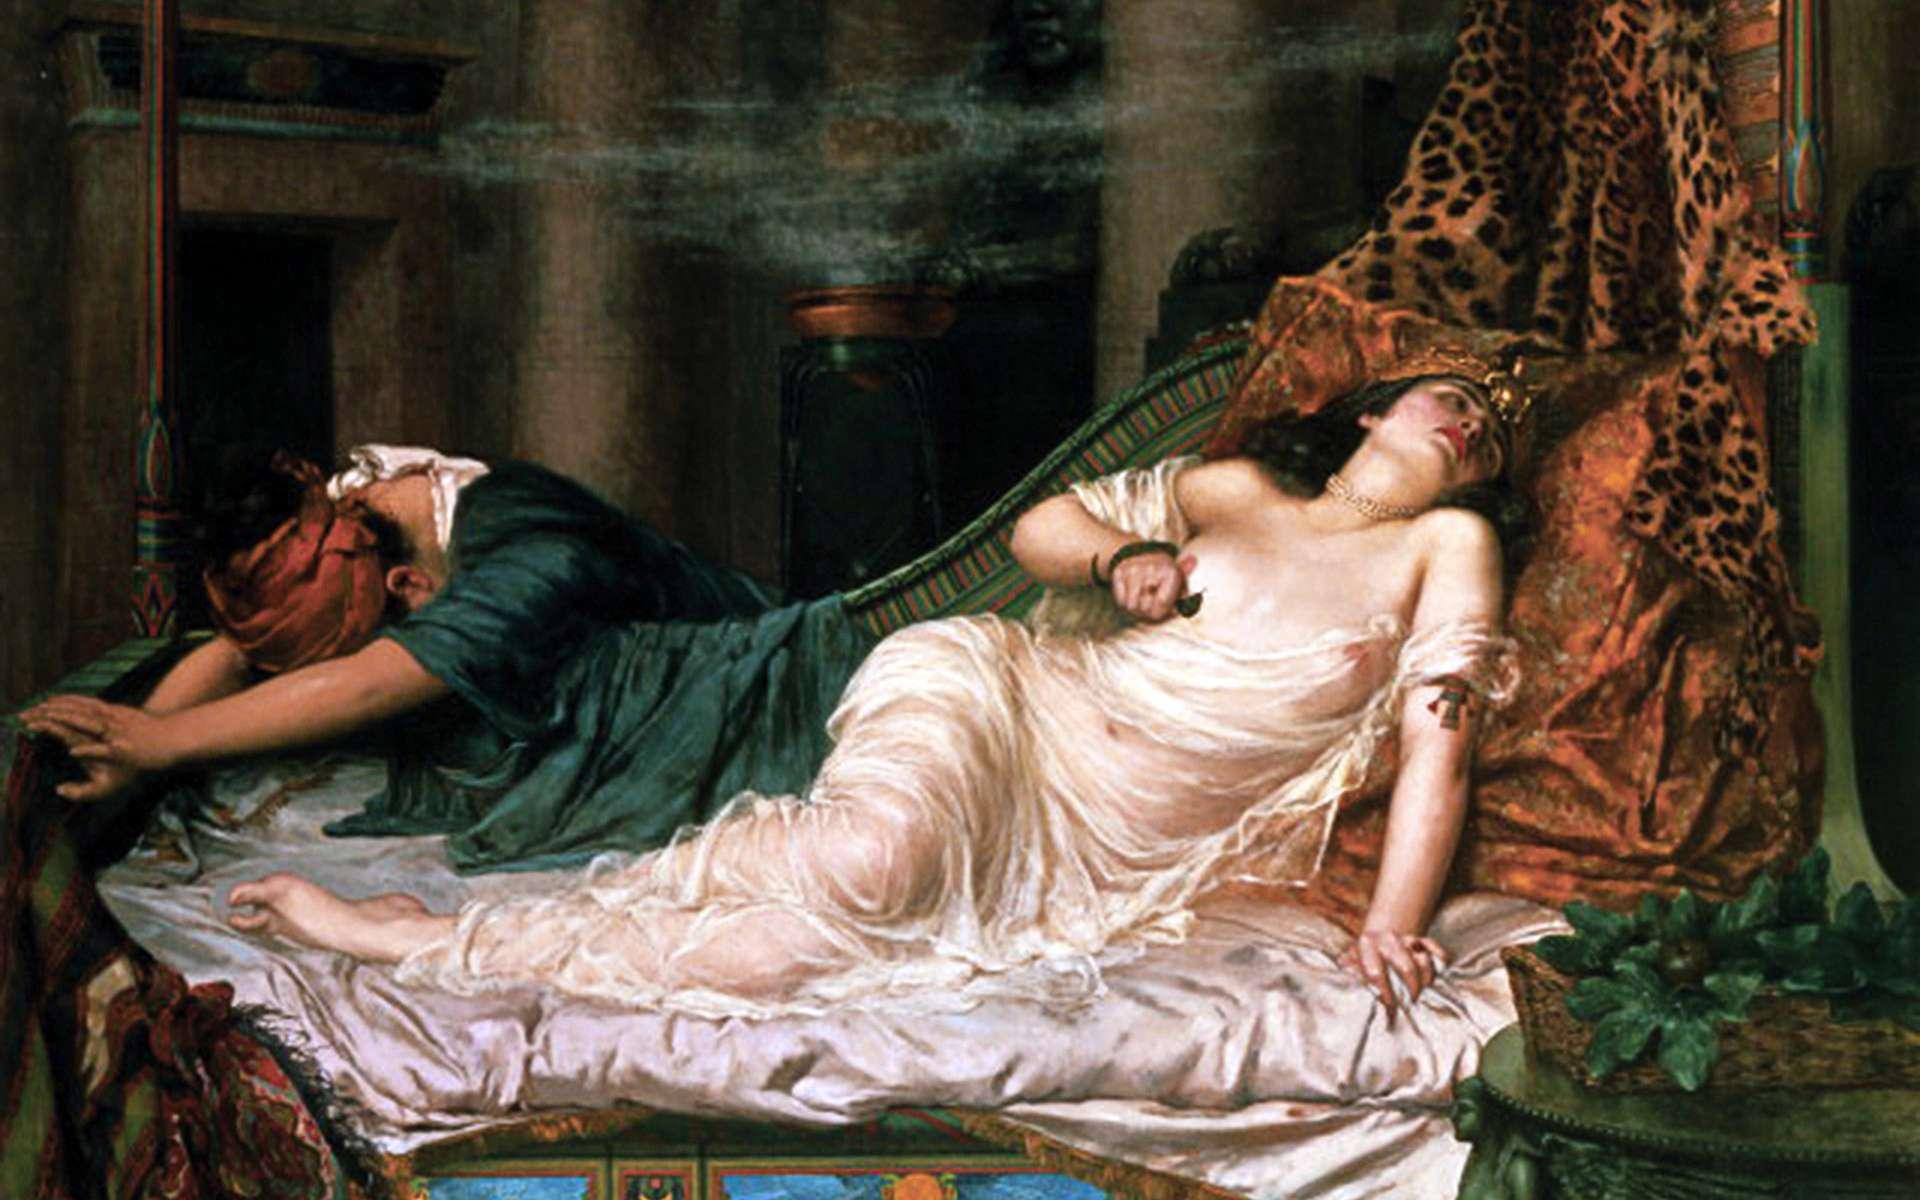 Mort de Cléopâtre par morsure de serpent. The Death of Cleopatra, Reginald Arthur (1892). © Roy Miles Gallery, Wikimedia Commons, DP